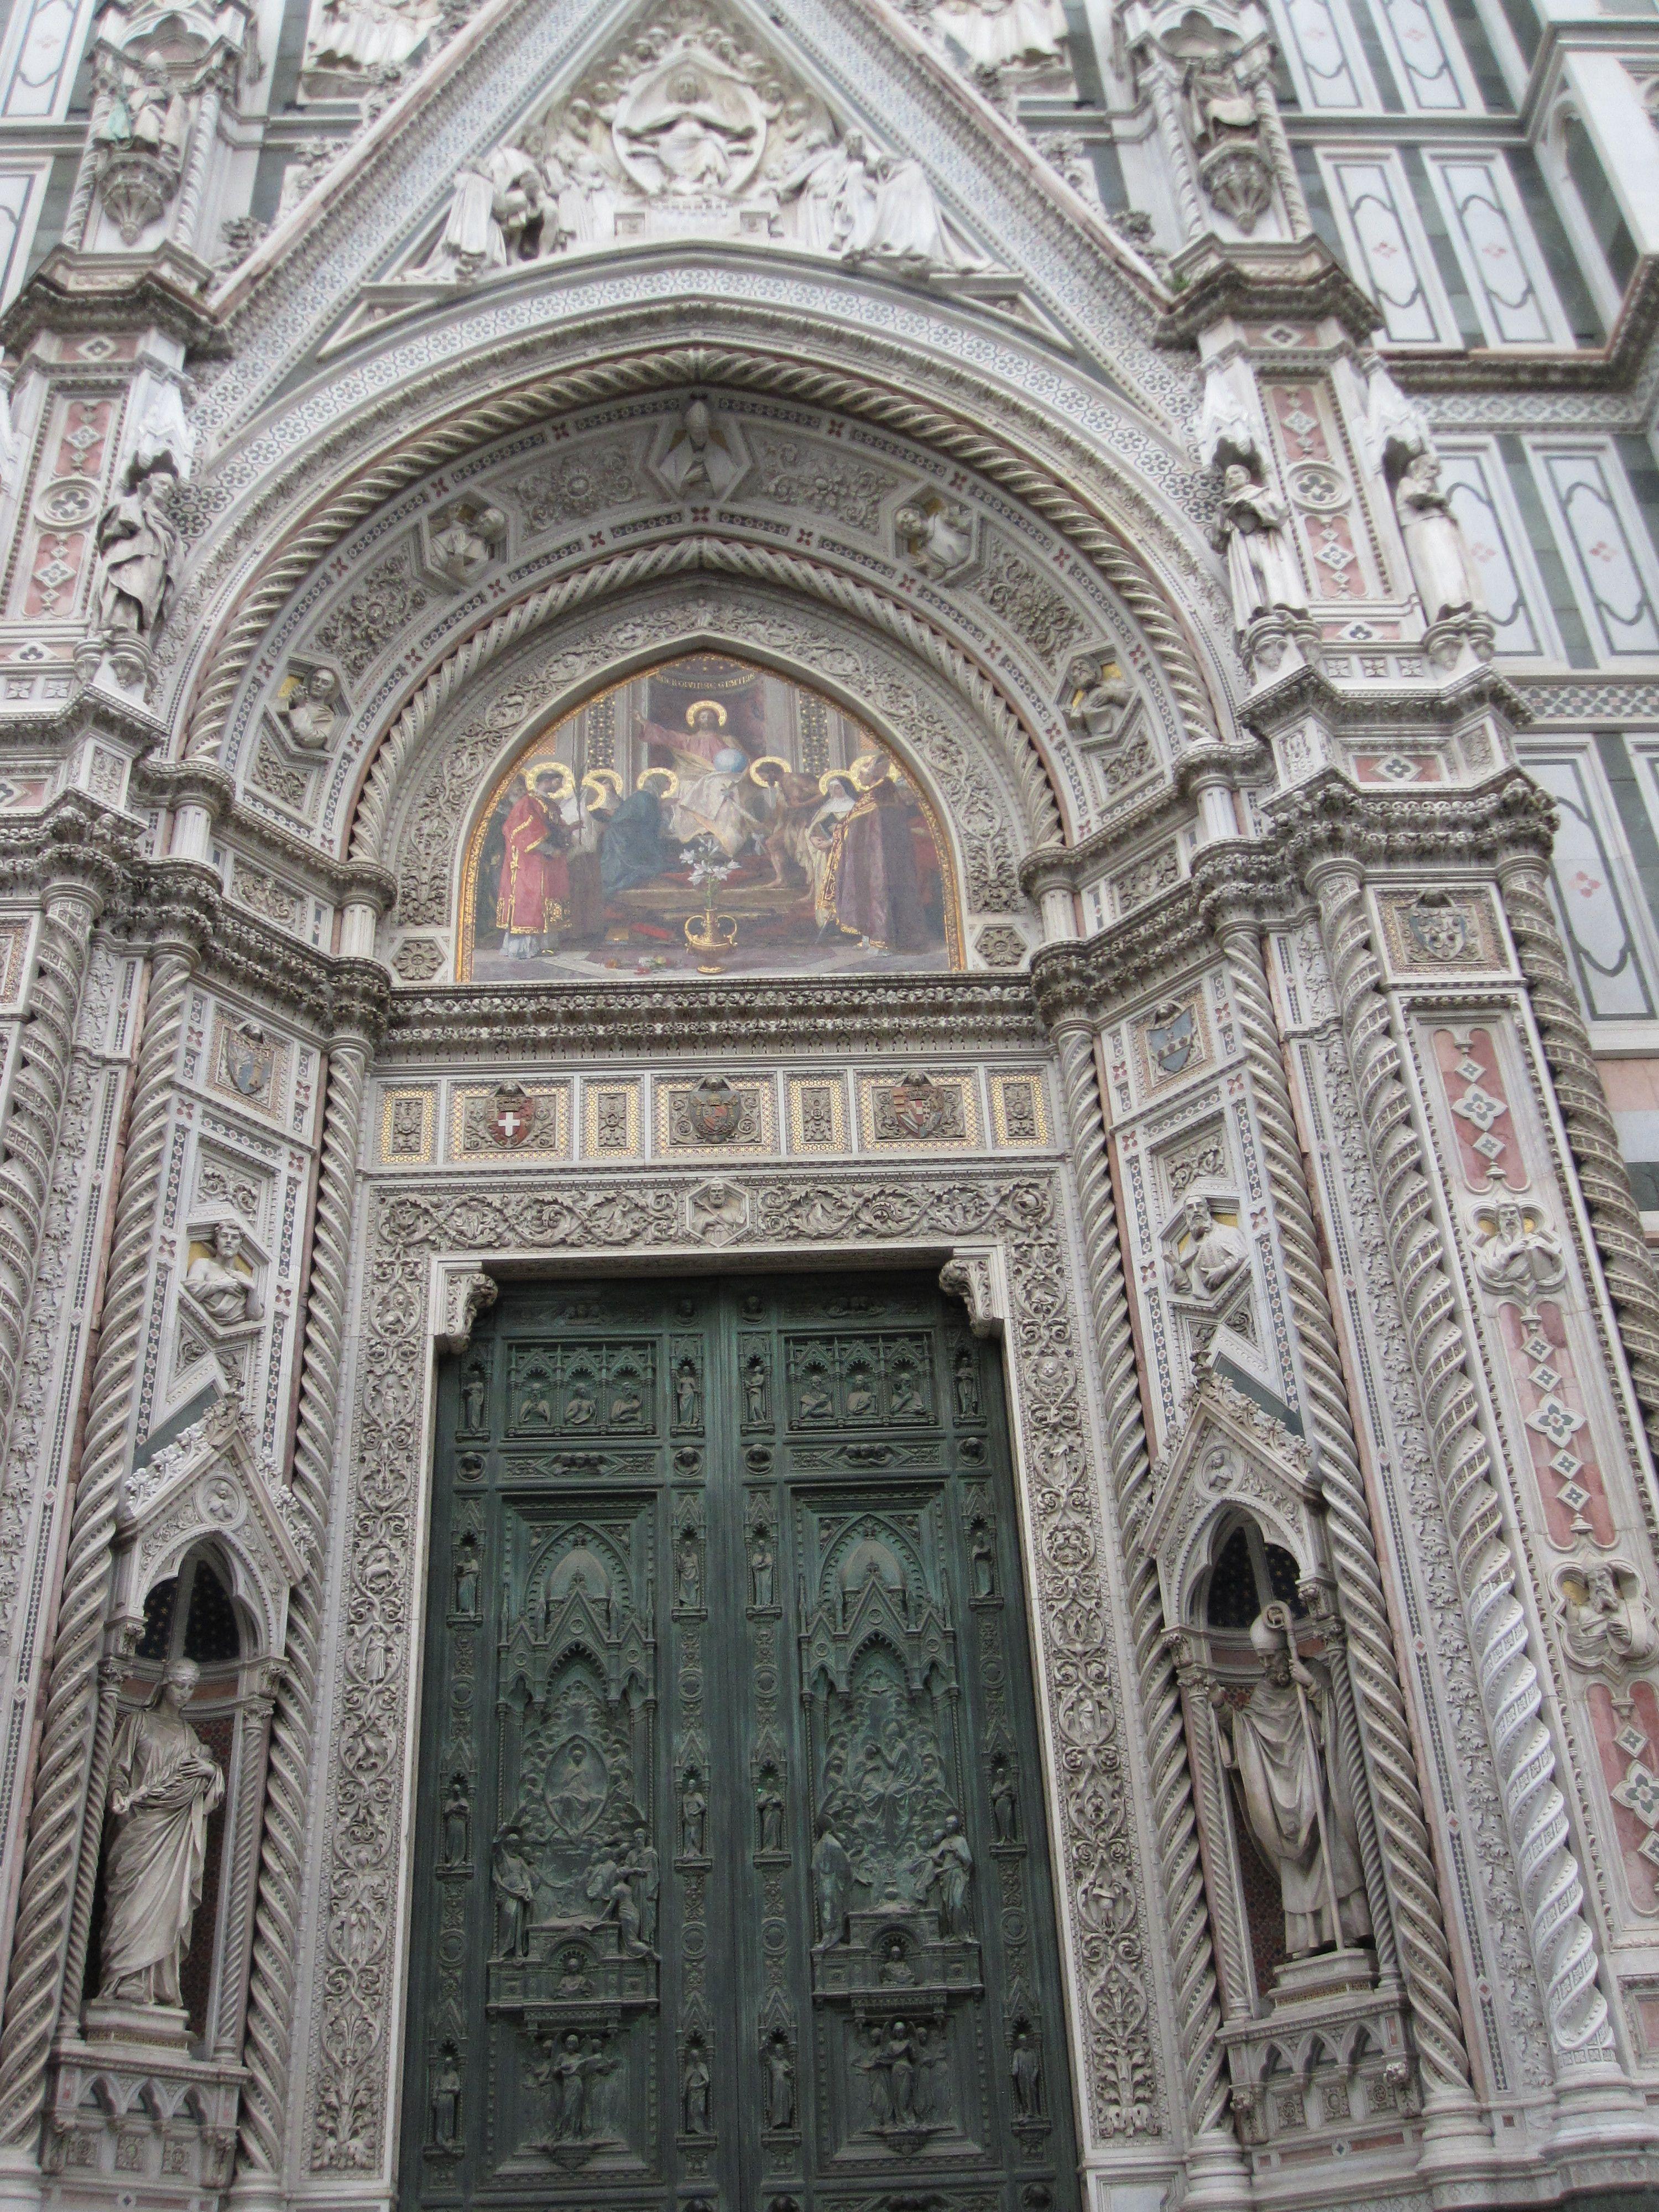 Firenze il duomo florence italy italy photo beautiful